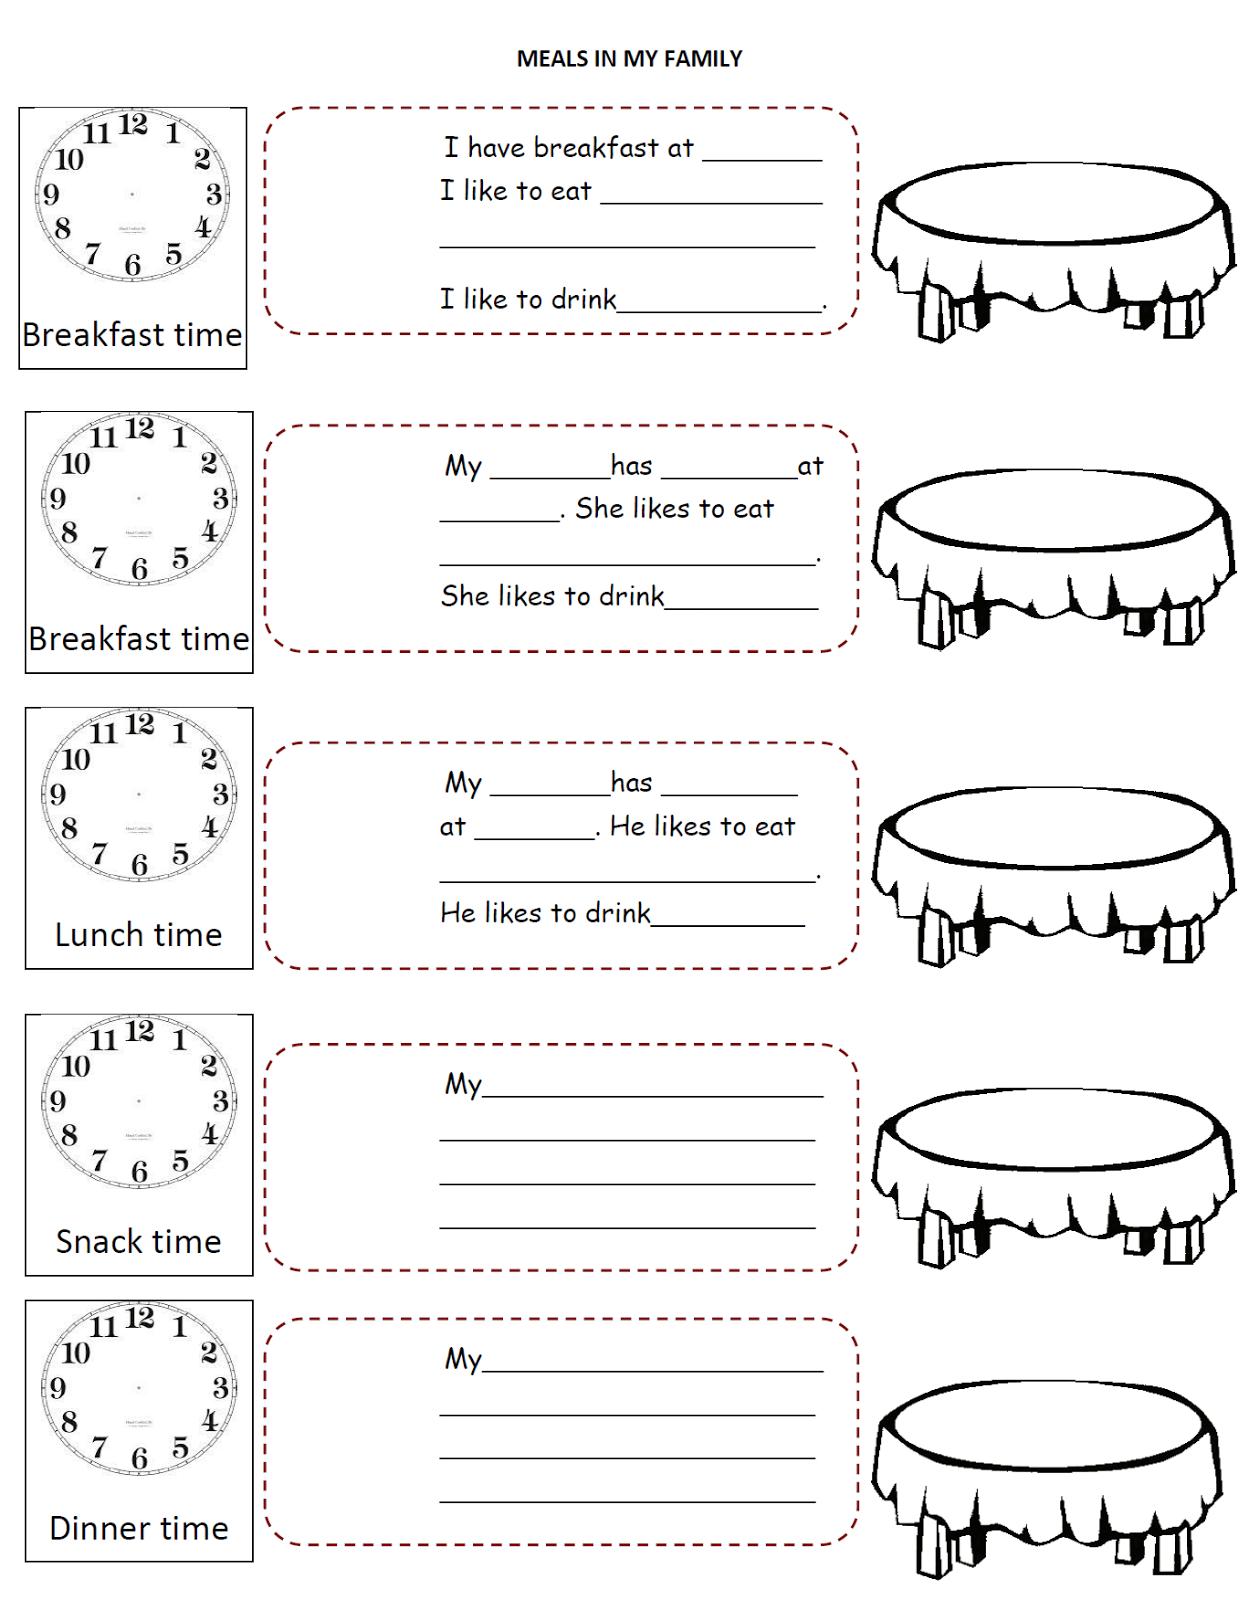 english fourth graders zone meals time worksheet. Black Bedroom Furniture Sets. Home Design Ideas